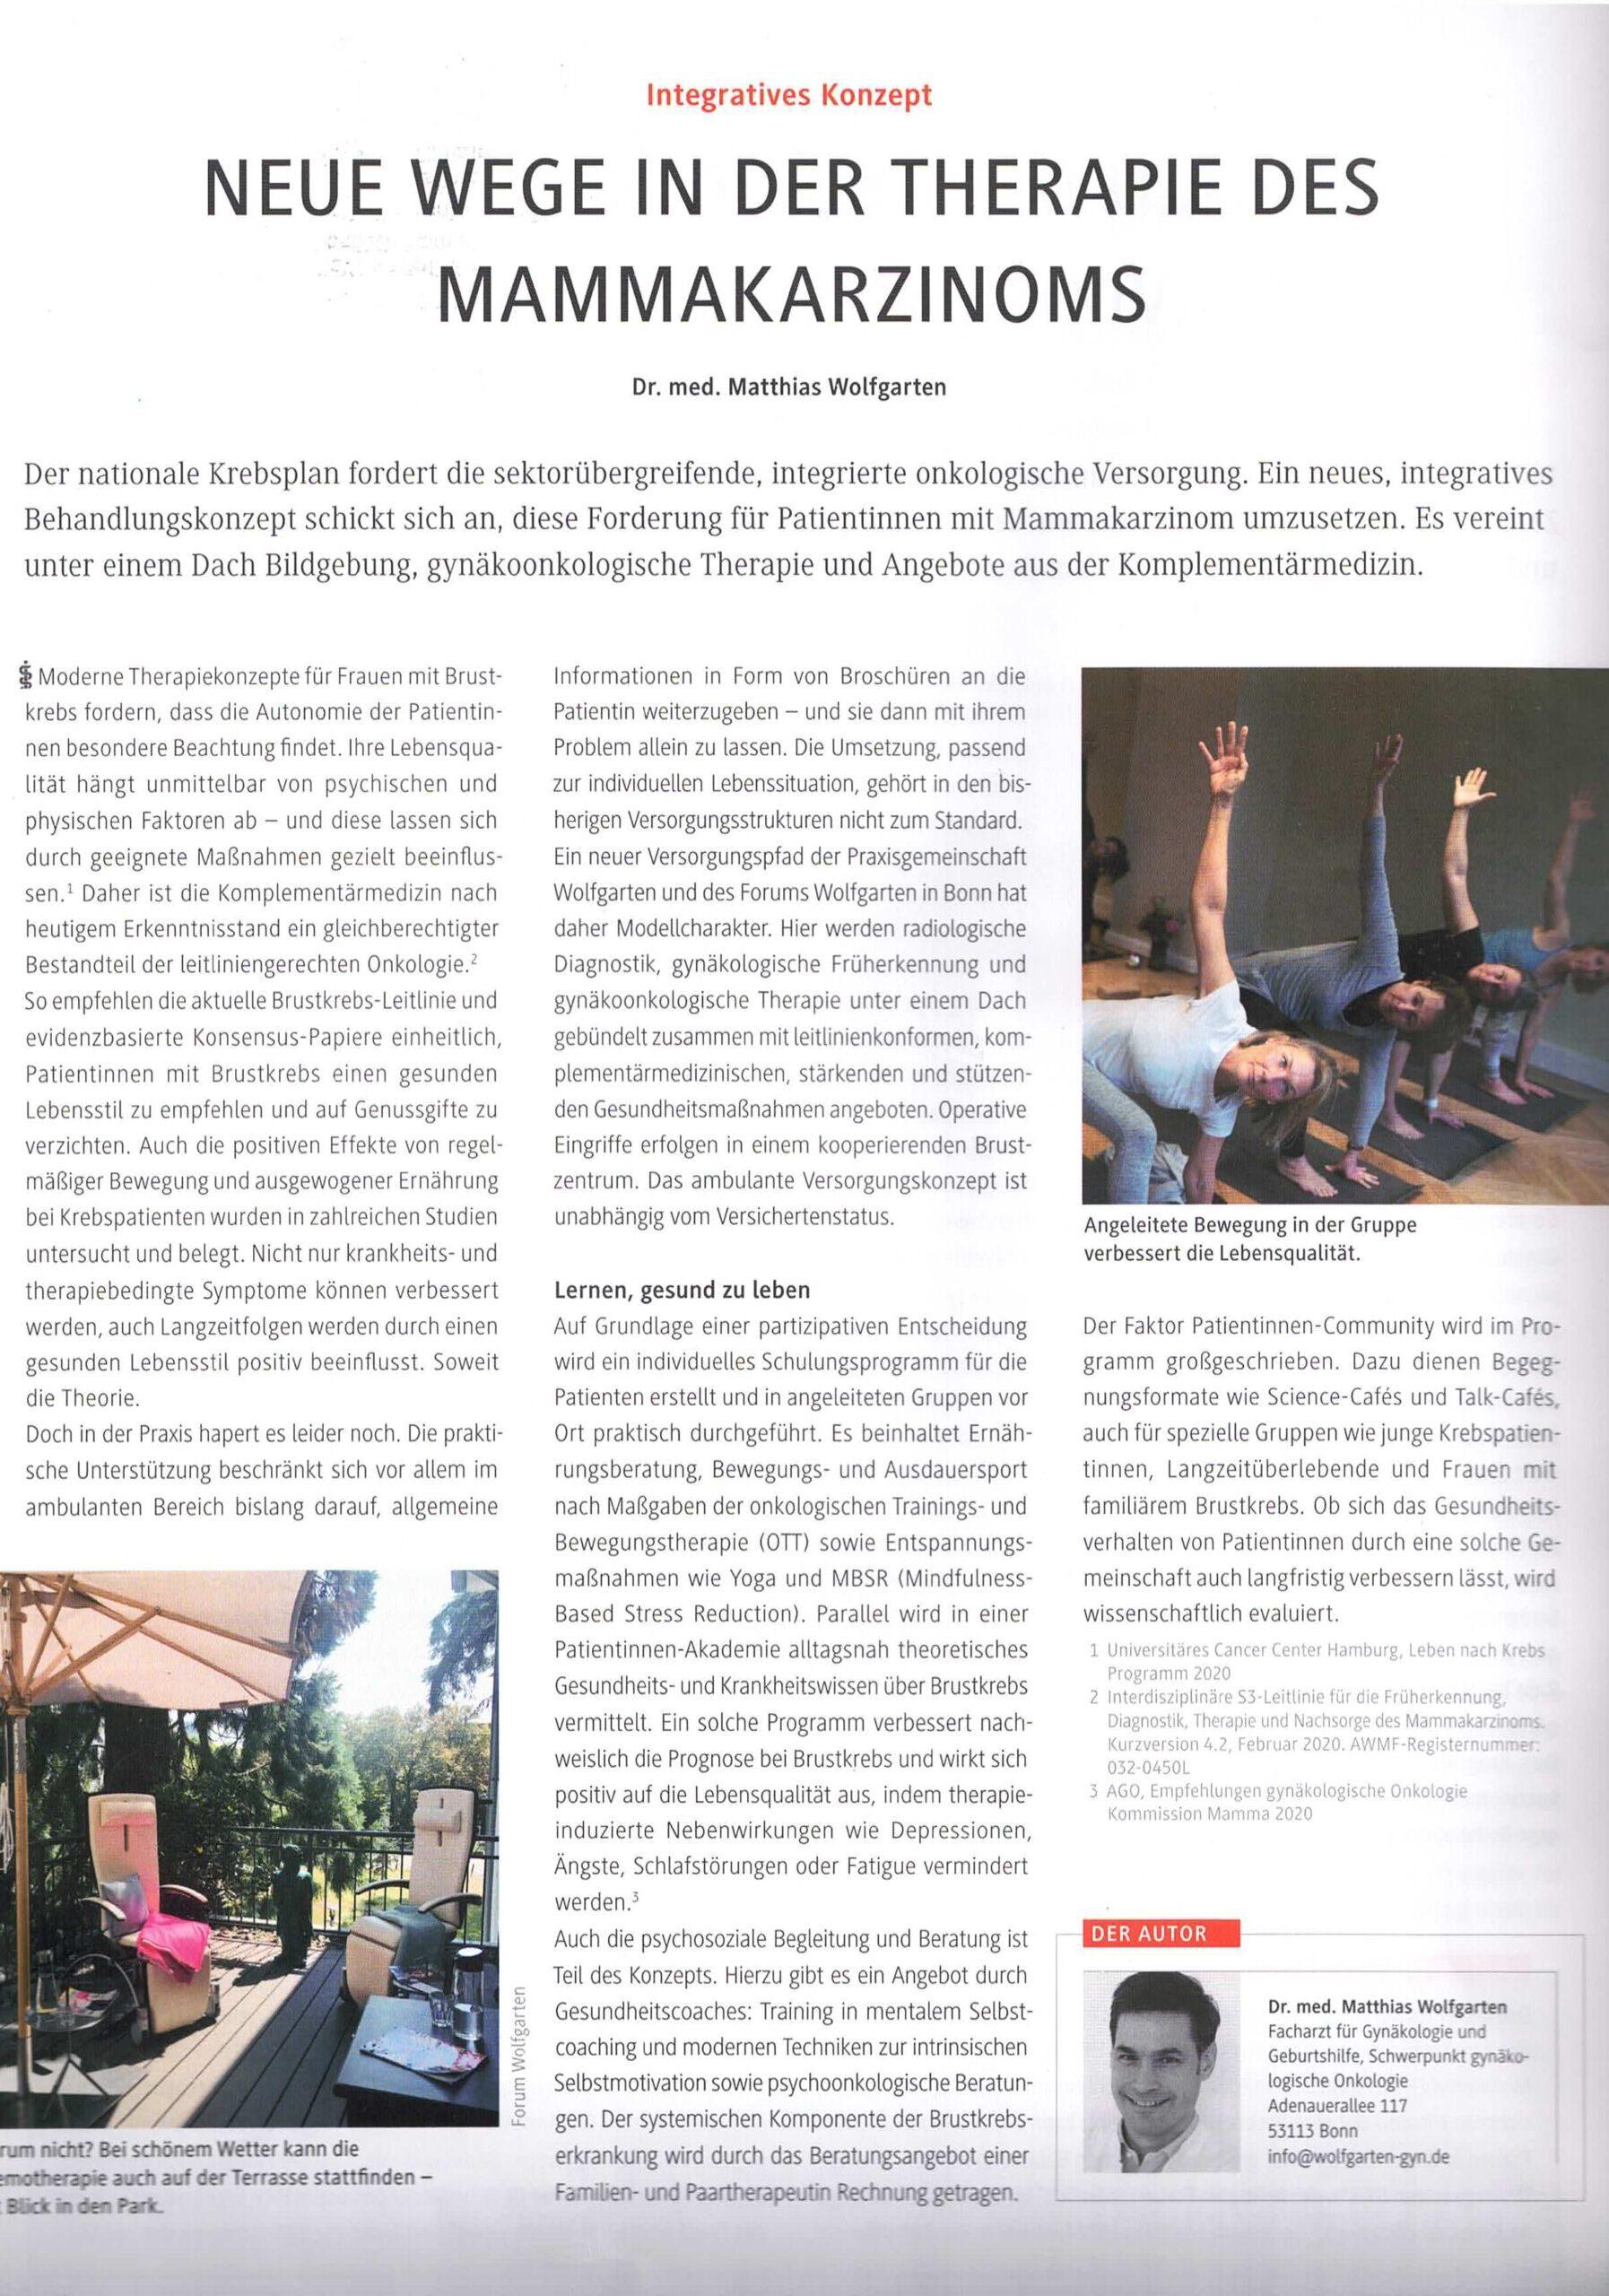 Der Privatarzt Gynäkologie Ausgabe 6 Dezember 2020 Artikel Integrative Konzept